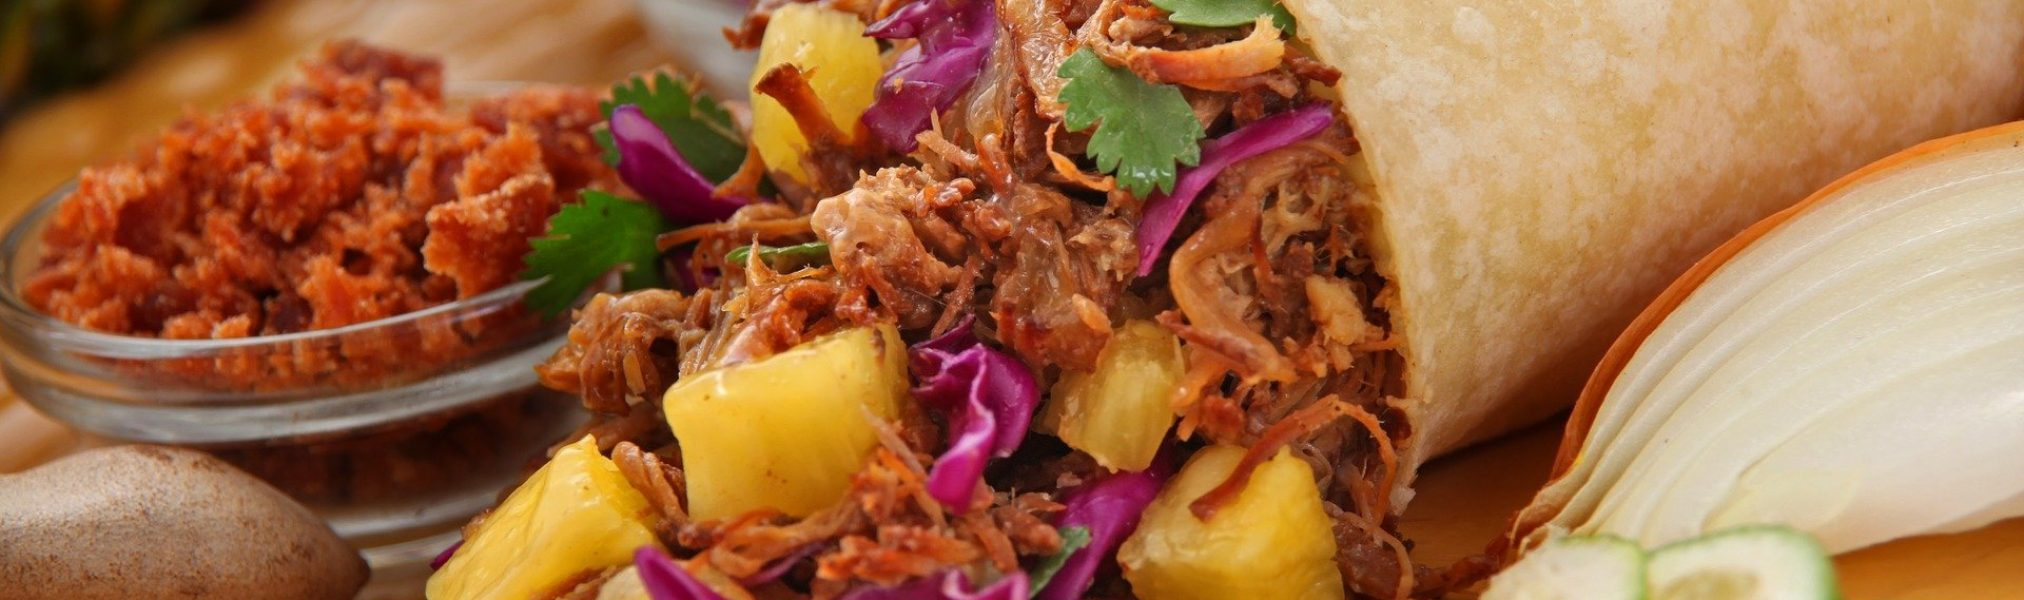 grilled-pineapple-pork-burrito-2944562_1920